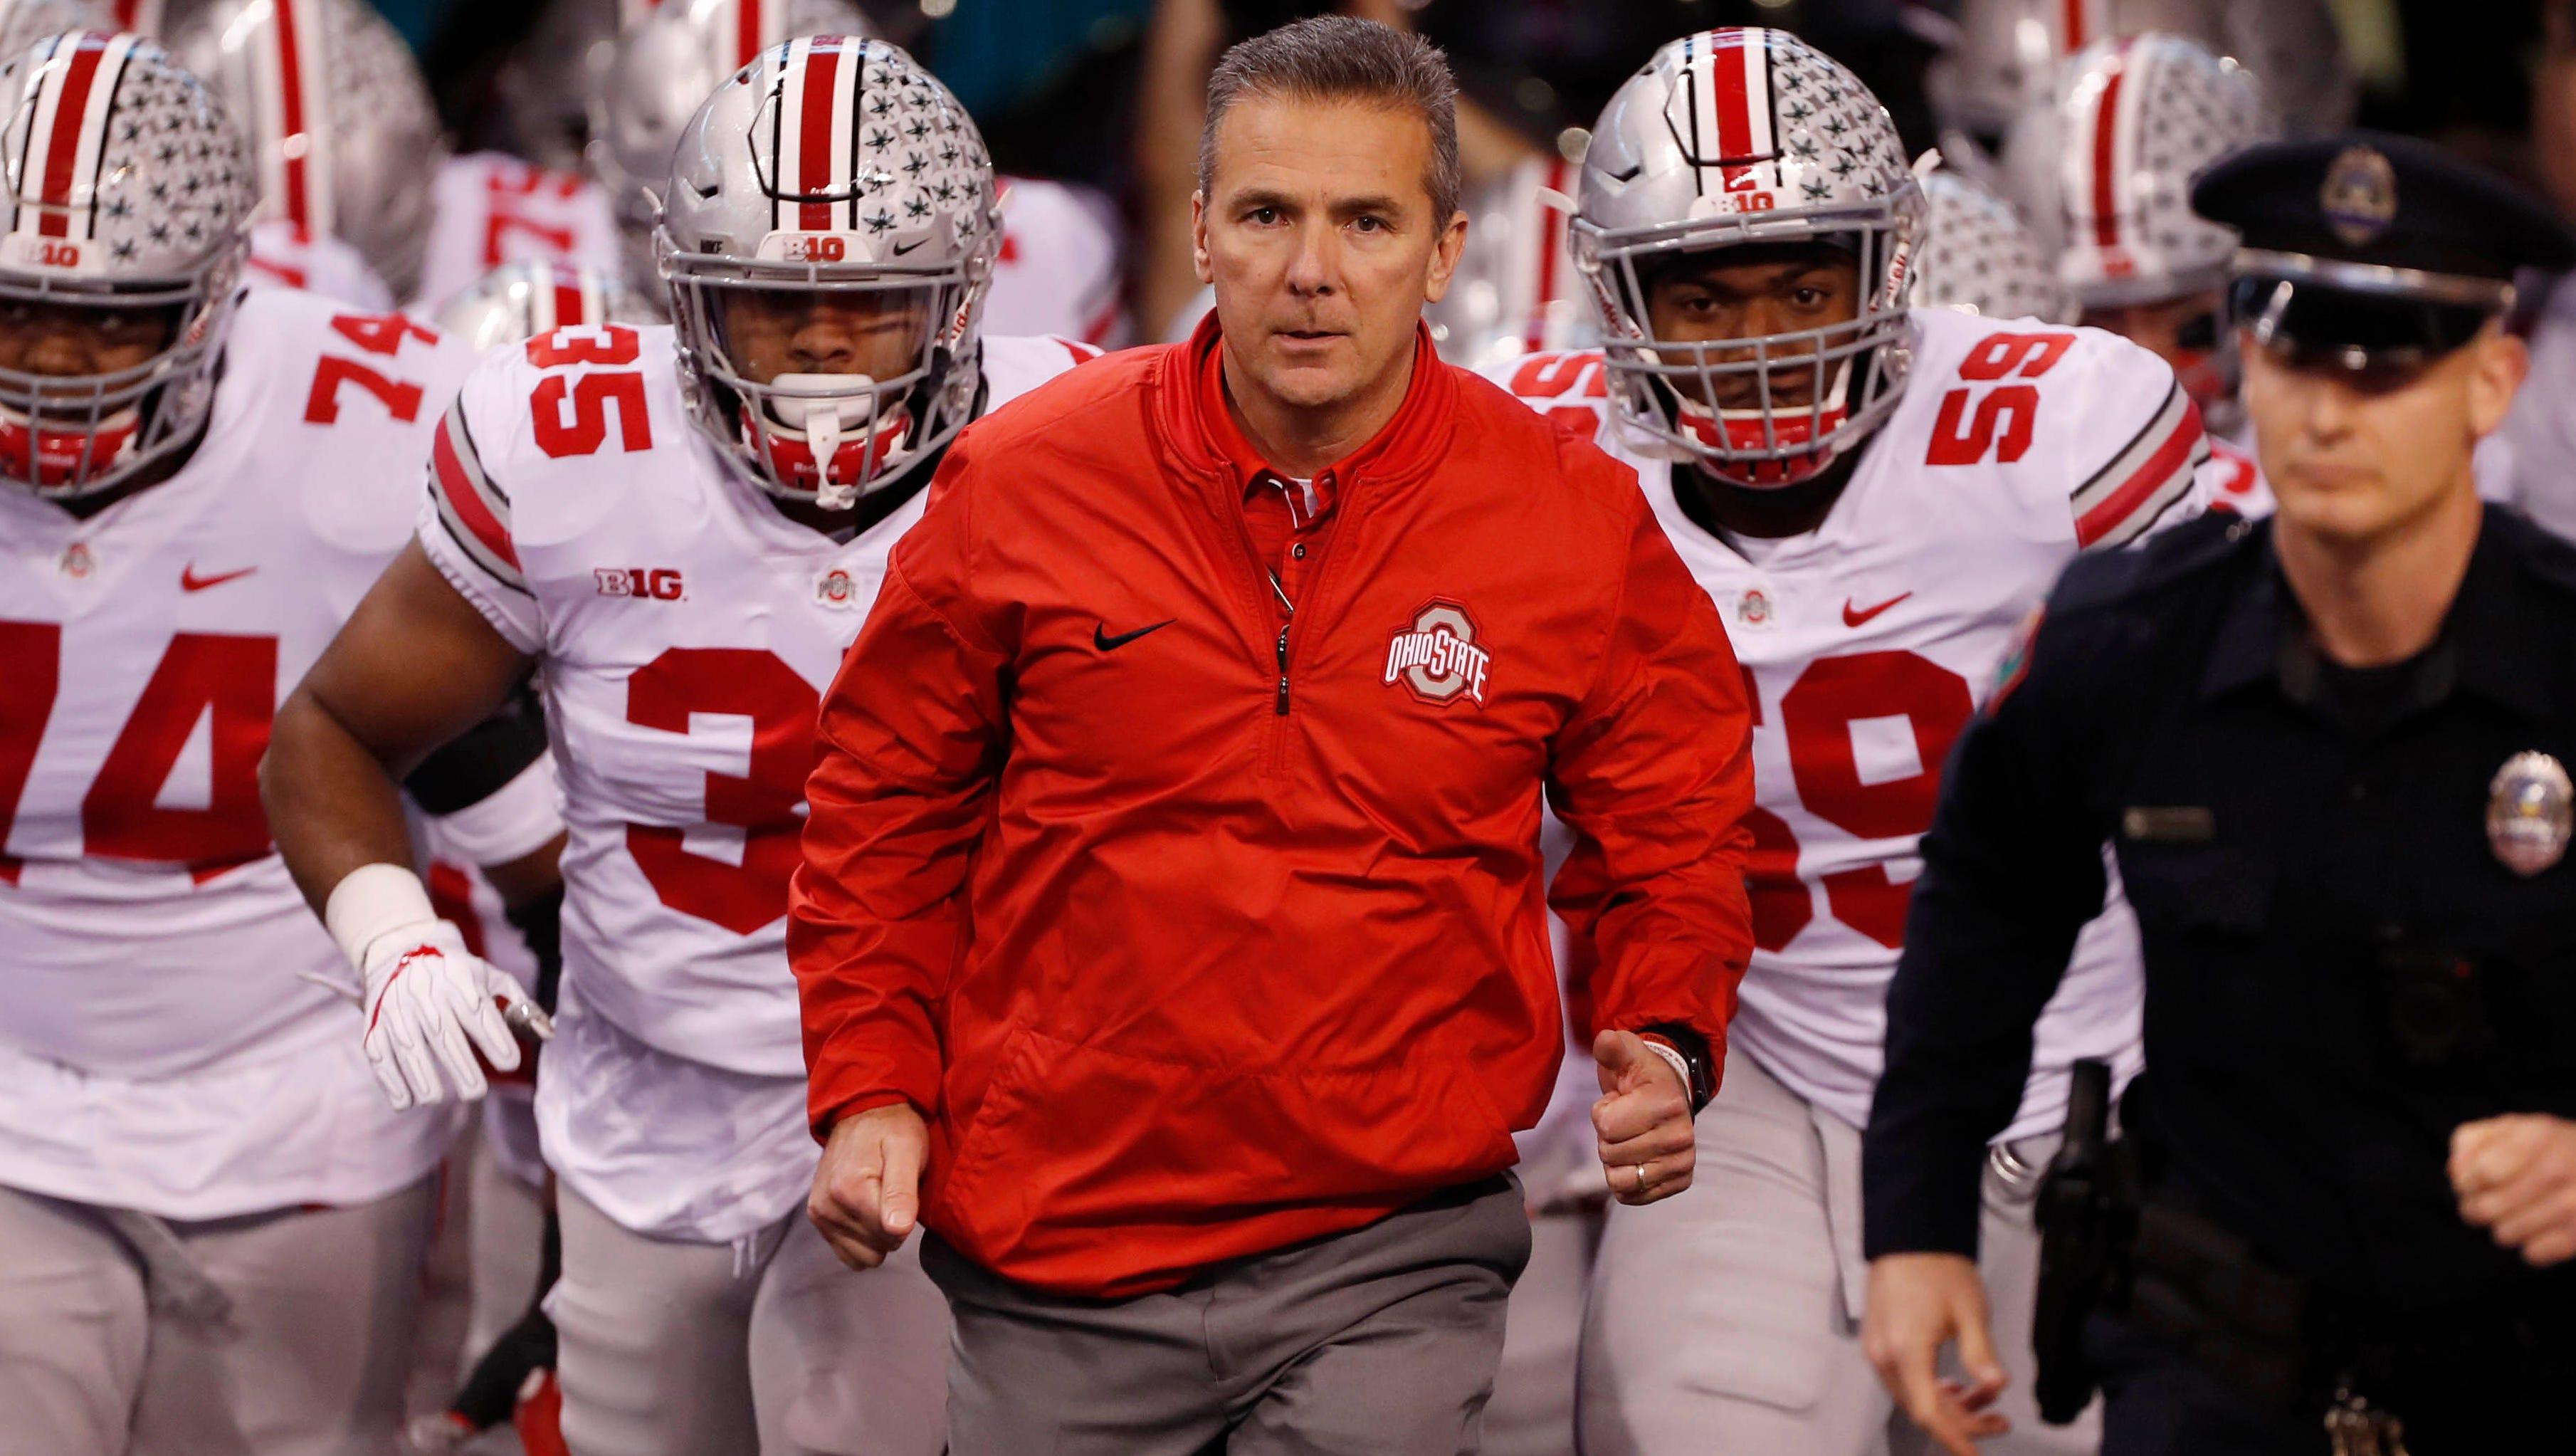 Ohio State Football Coach Urban Meyer Suspended Three Games